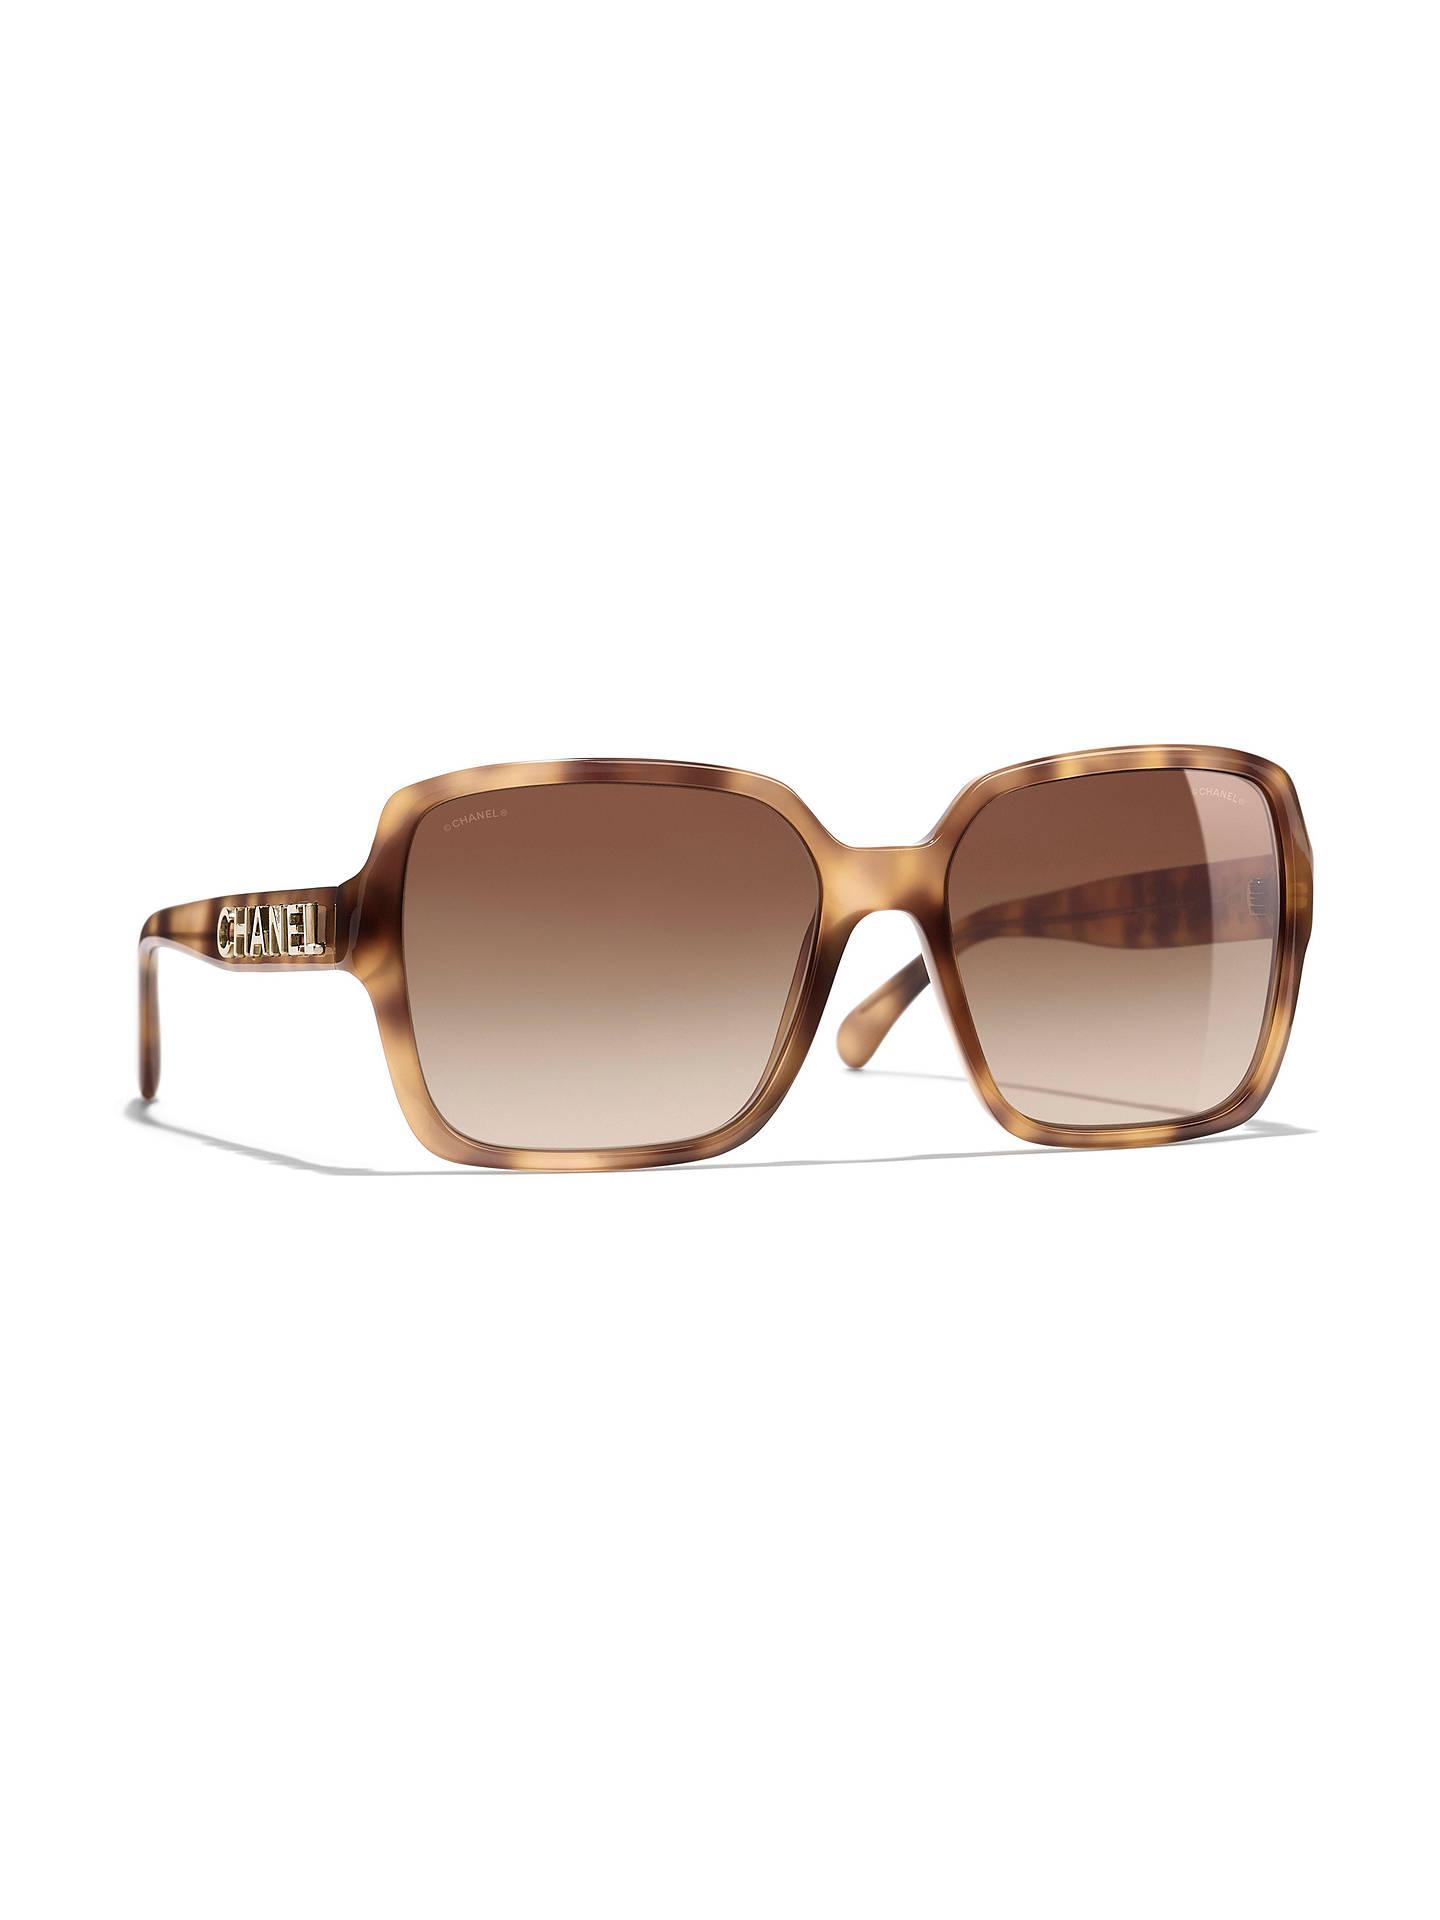 3b41ae8f21 Buy CHANEL Rectangular Sunglasses CH5408 Yellow Havana Brown Gradient  Online at johnlewis.com ...